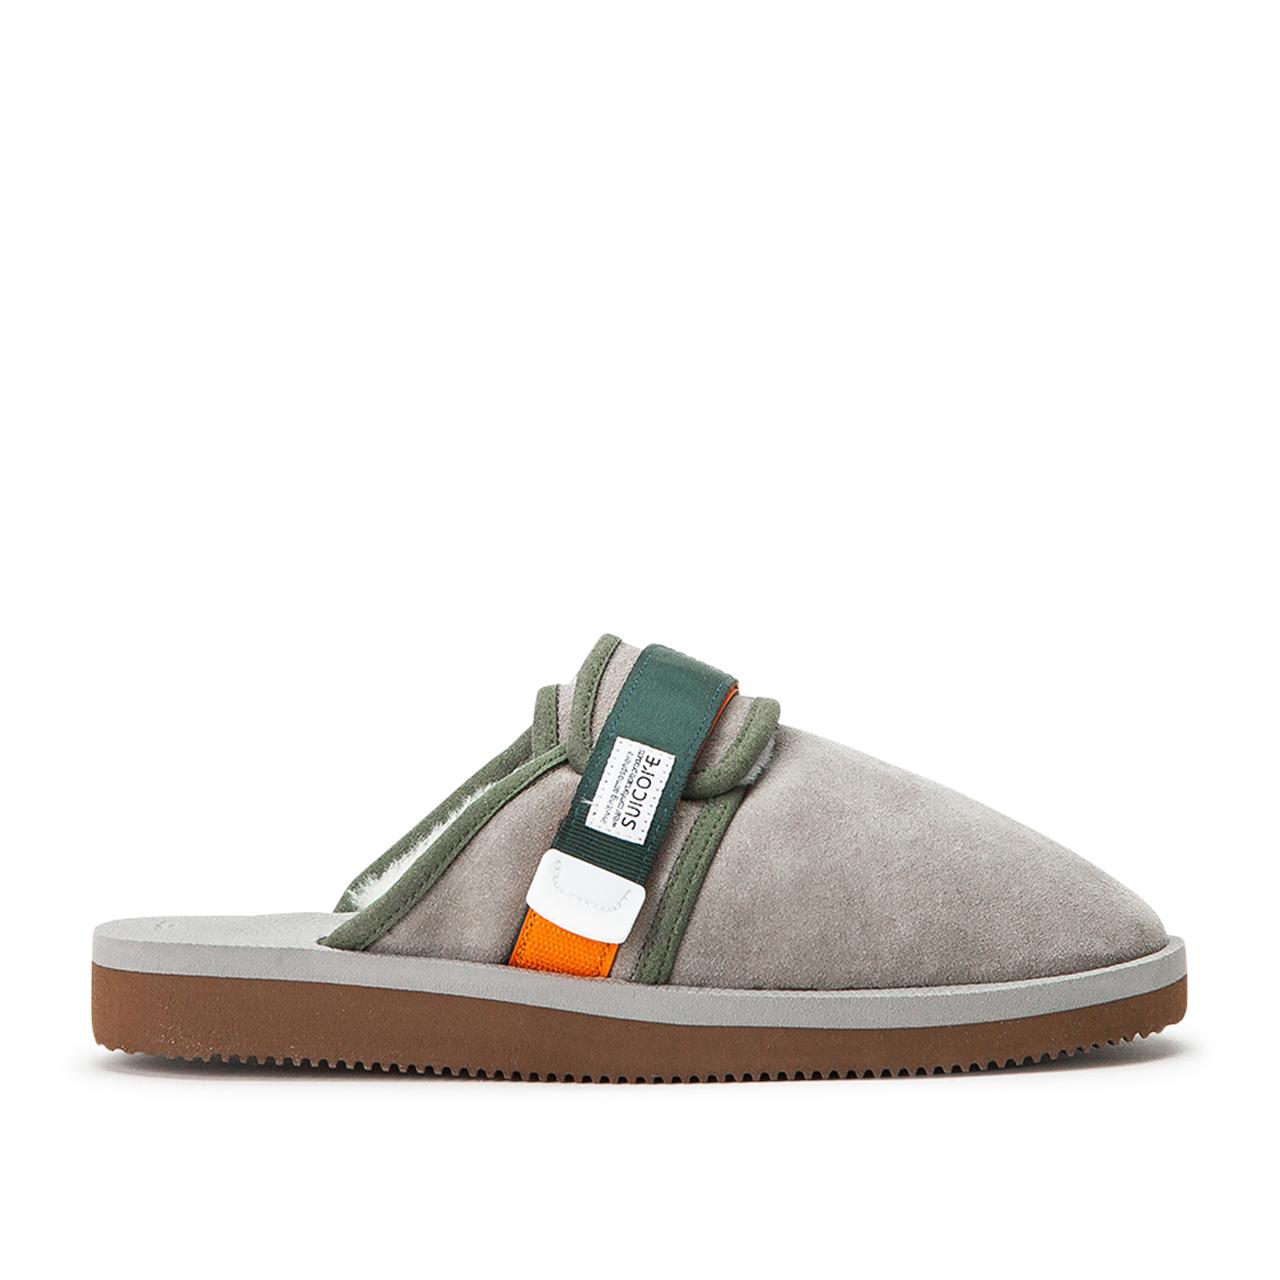 Suicoke Sandals Zavo-Mab (Grau) - OG-072MAB-102